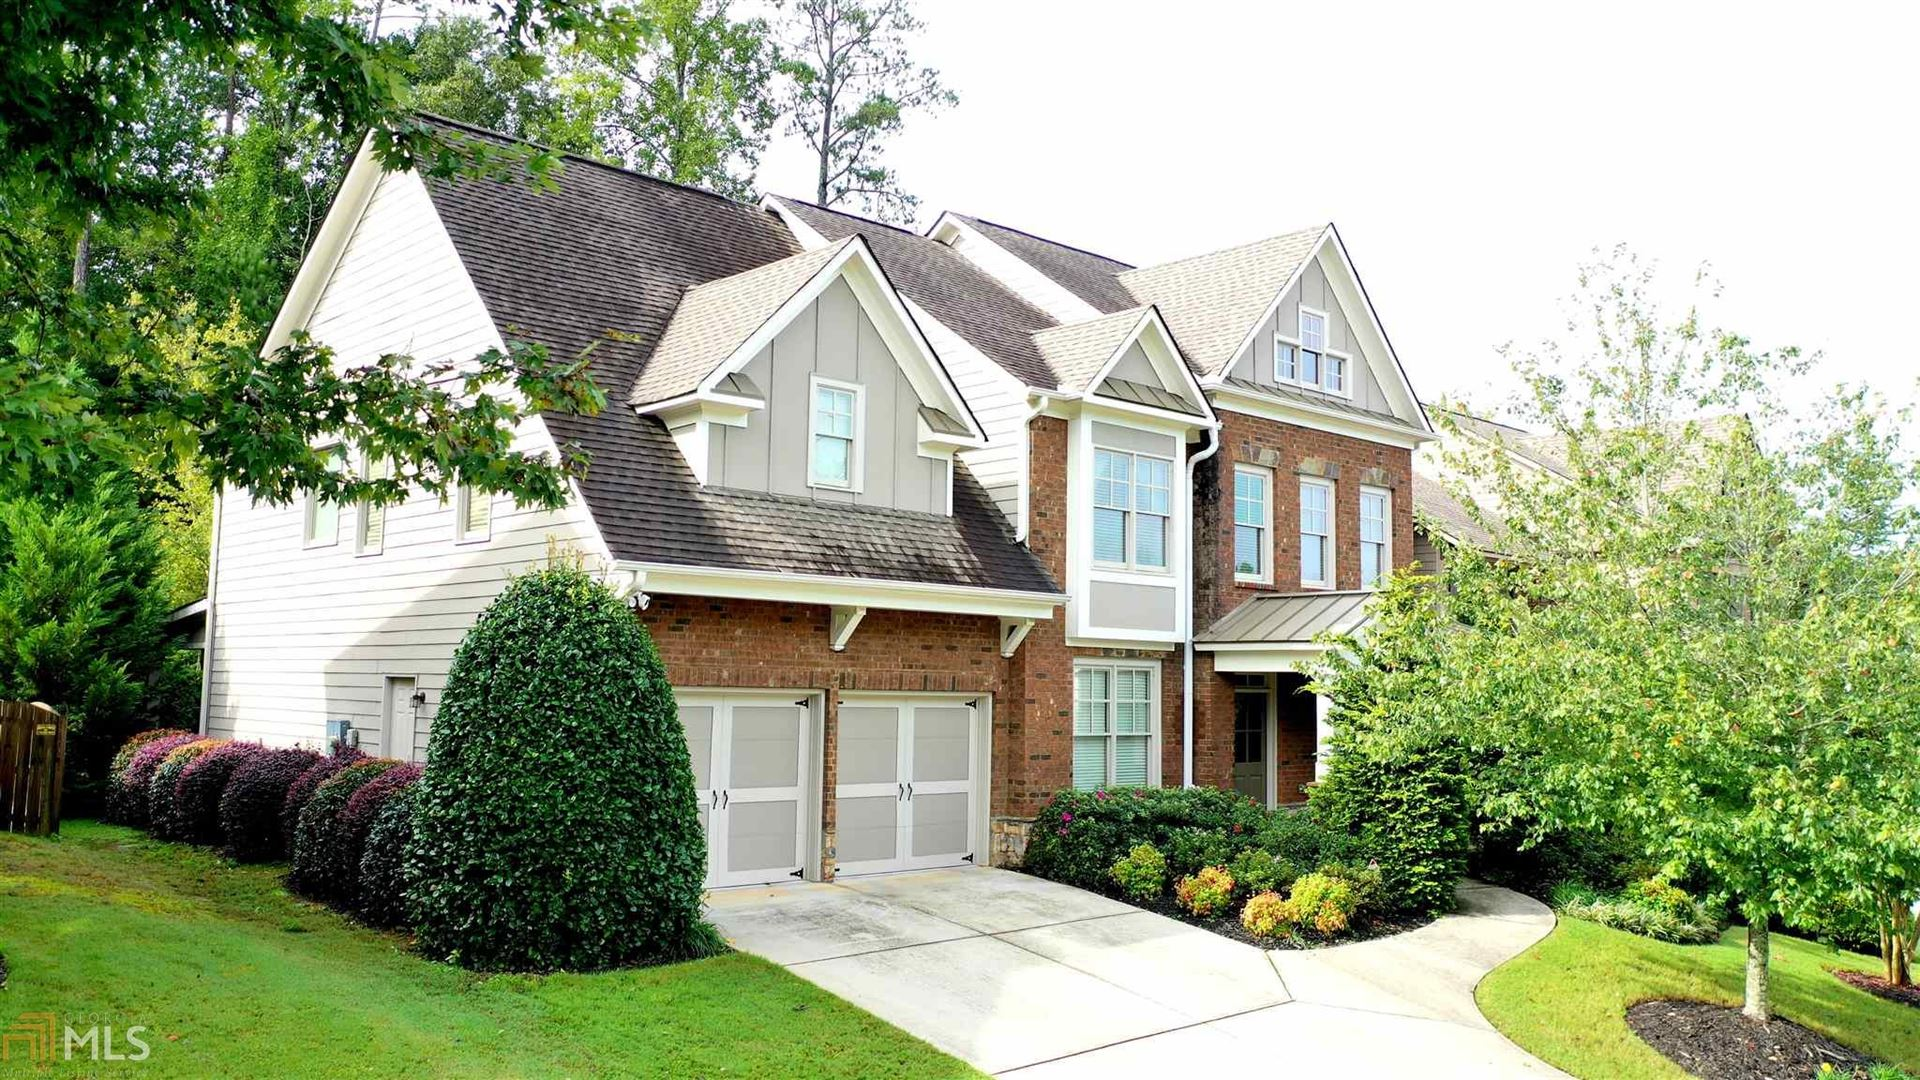 4186 Hill House Rd, Smyrna, GA 30082 - #: 8858896